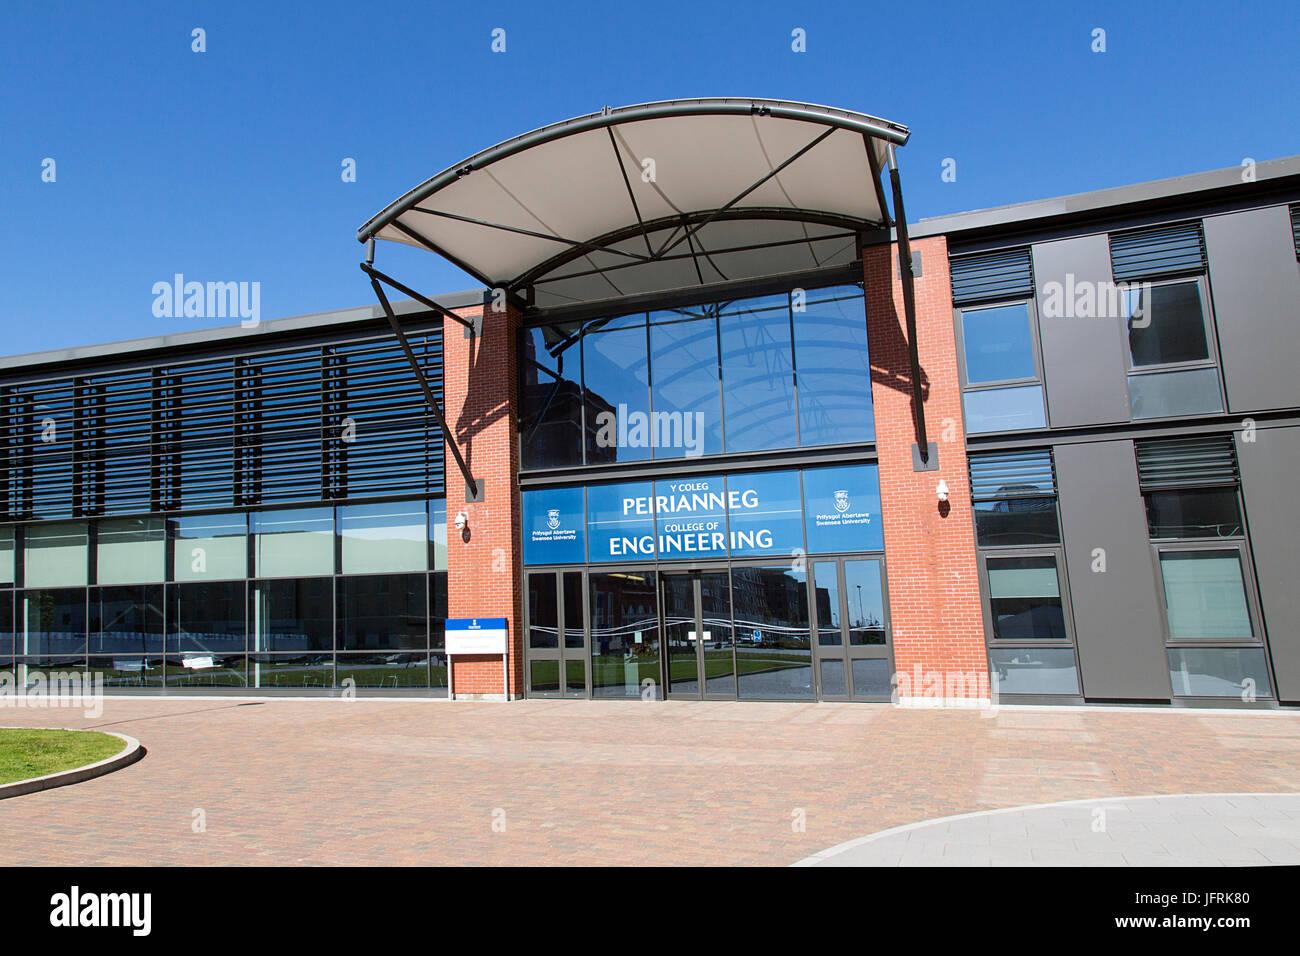 Swansea Bay Campus - Engineering Building - Stock Image